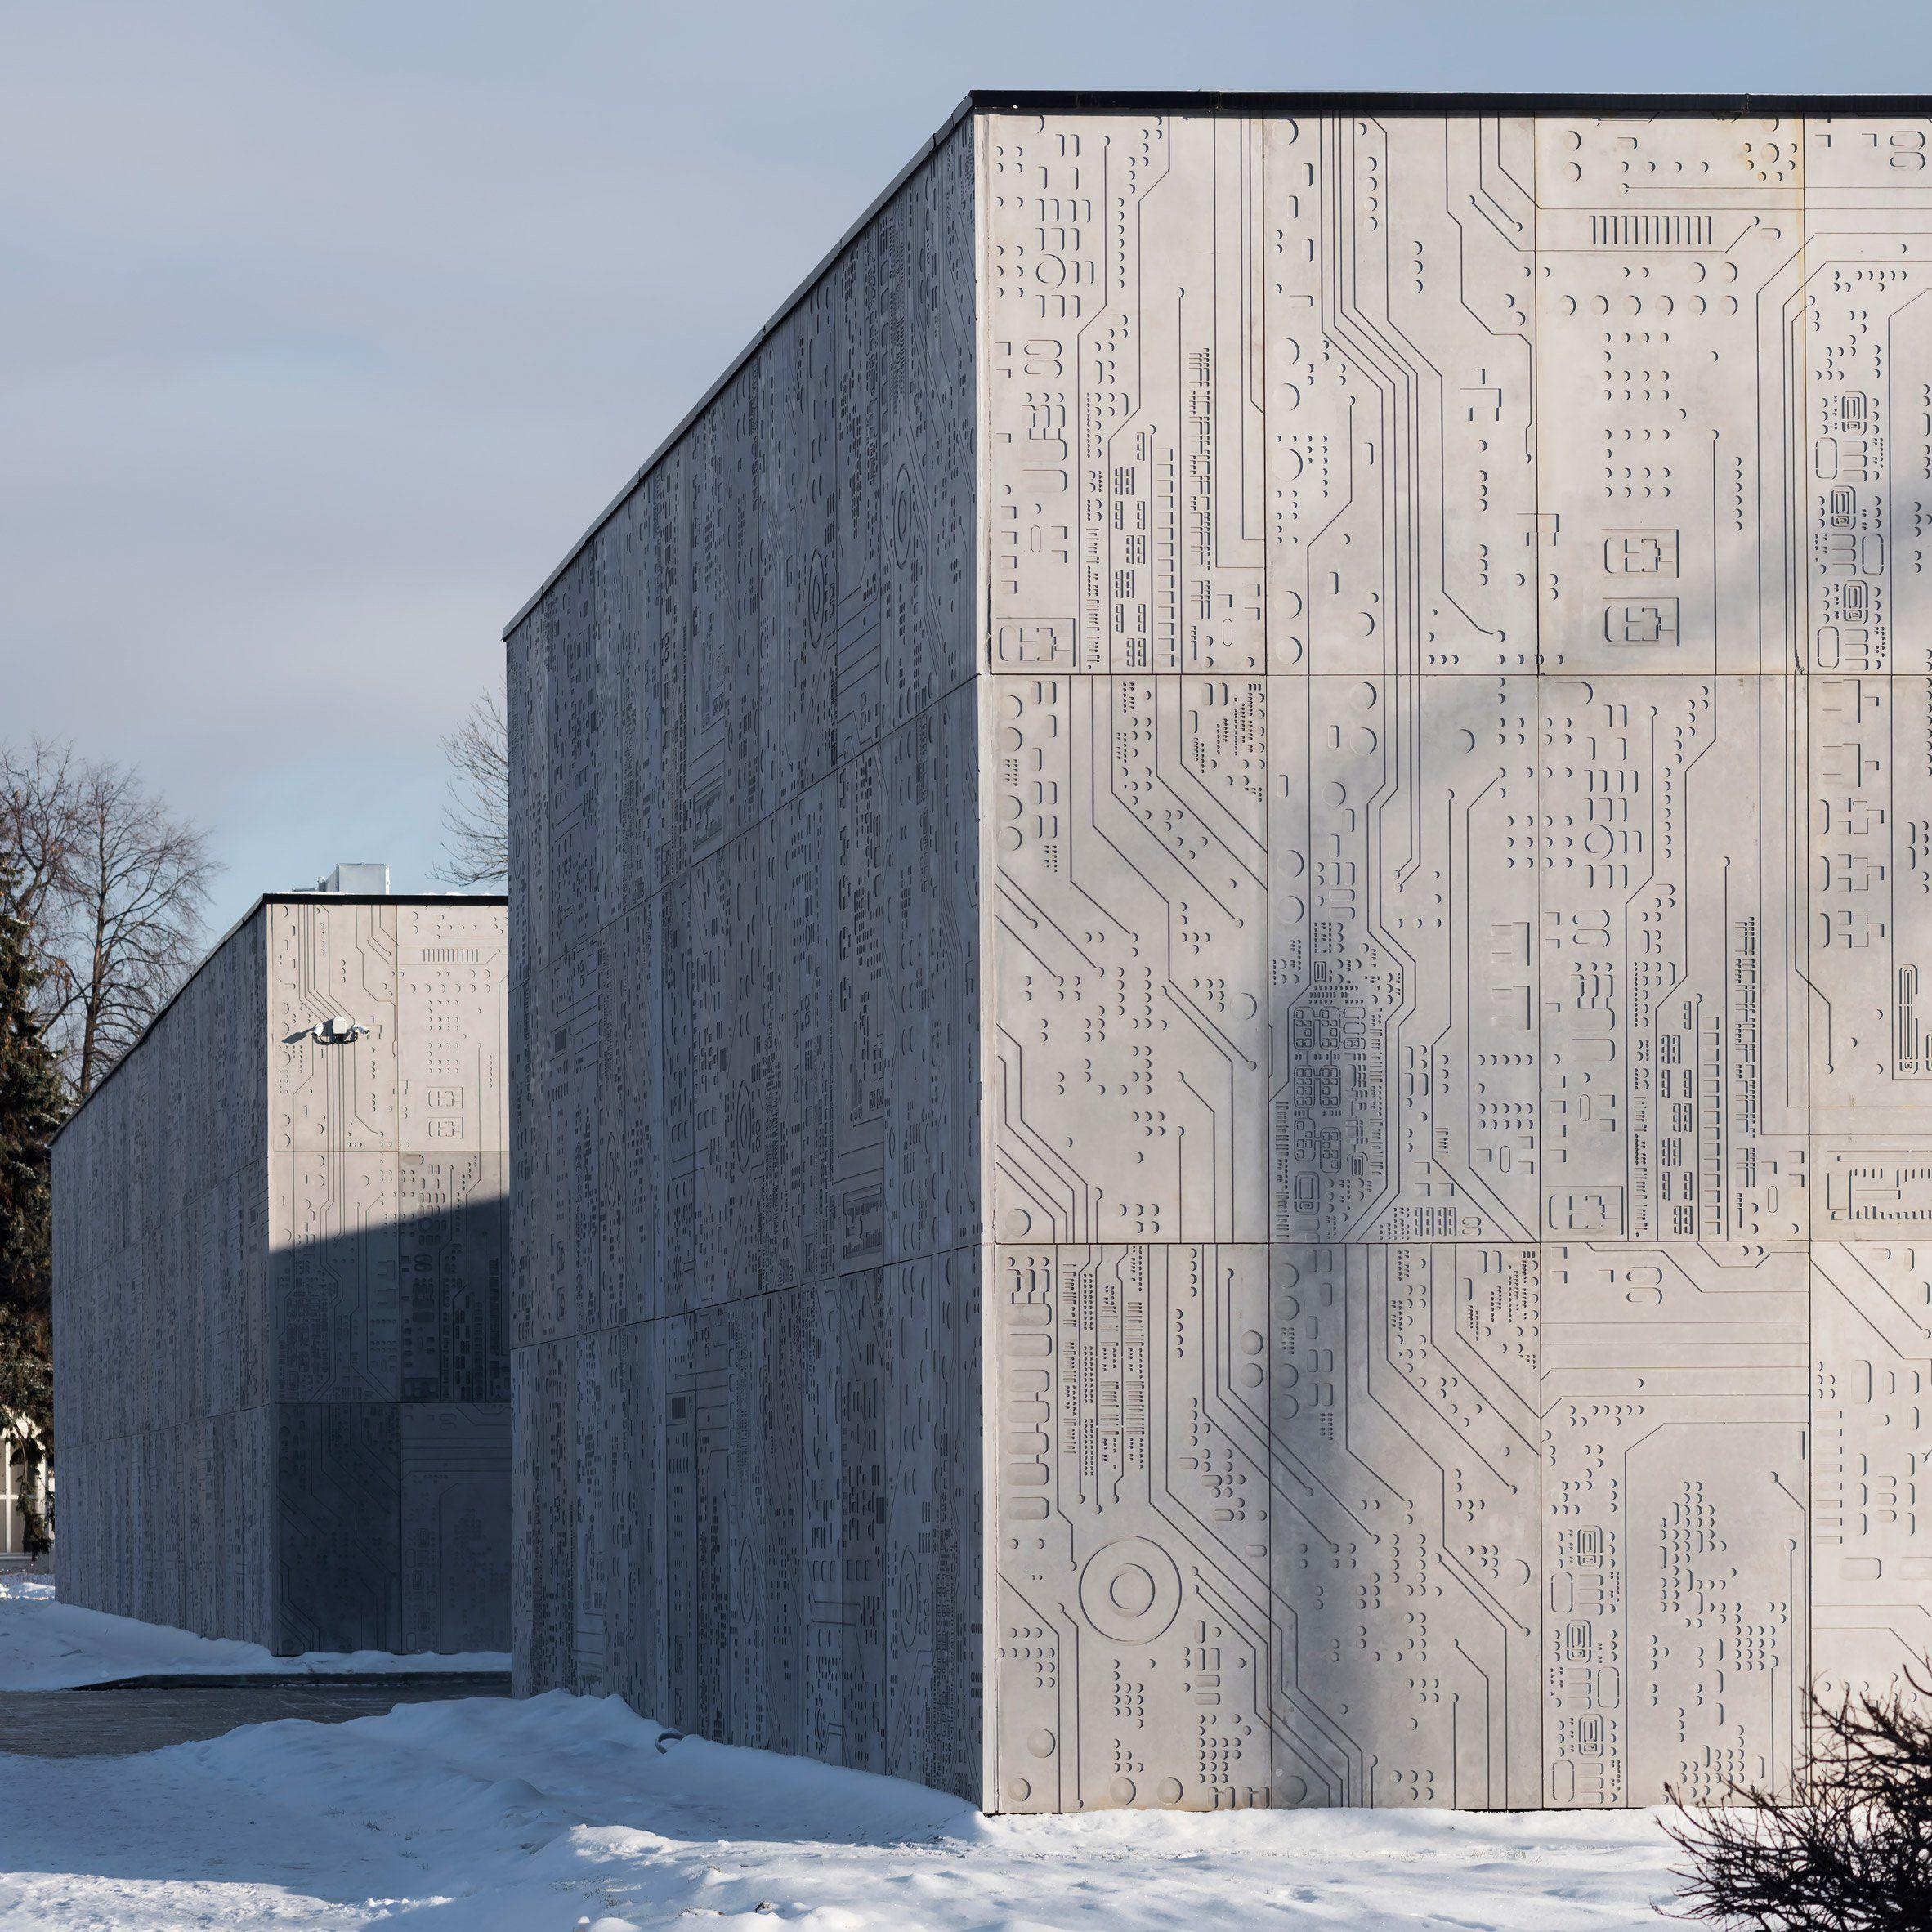 The fibreglassconcrete facades of this technology centre in moscow